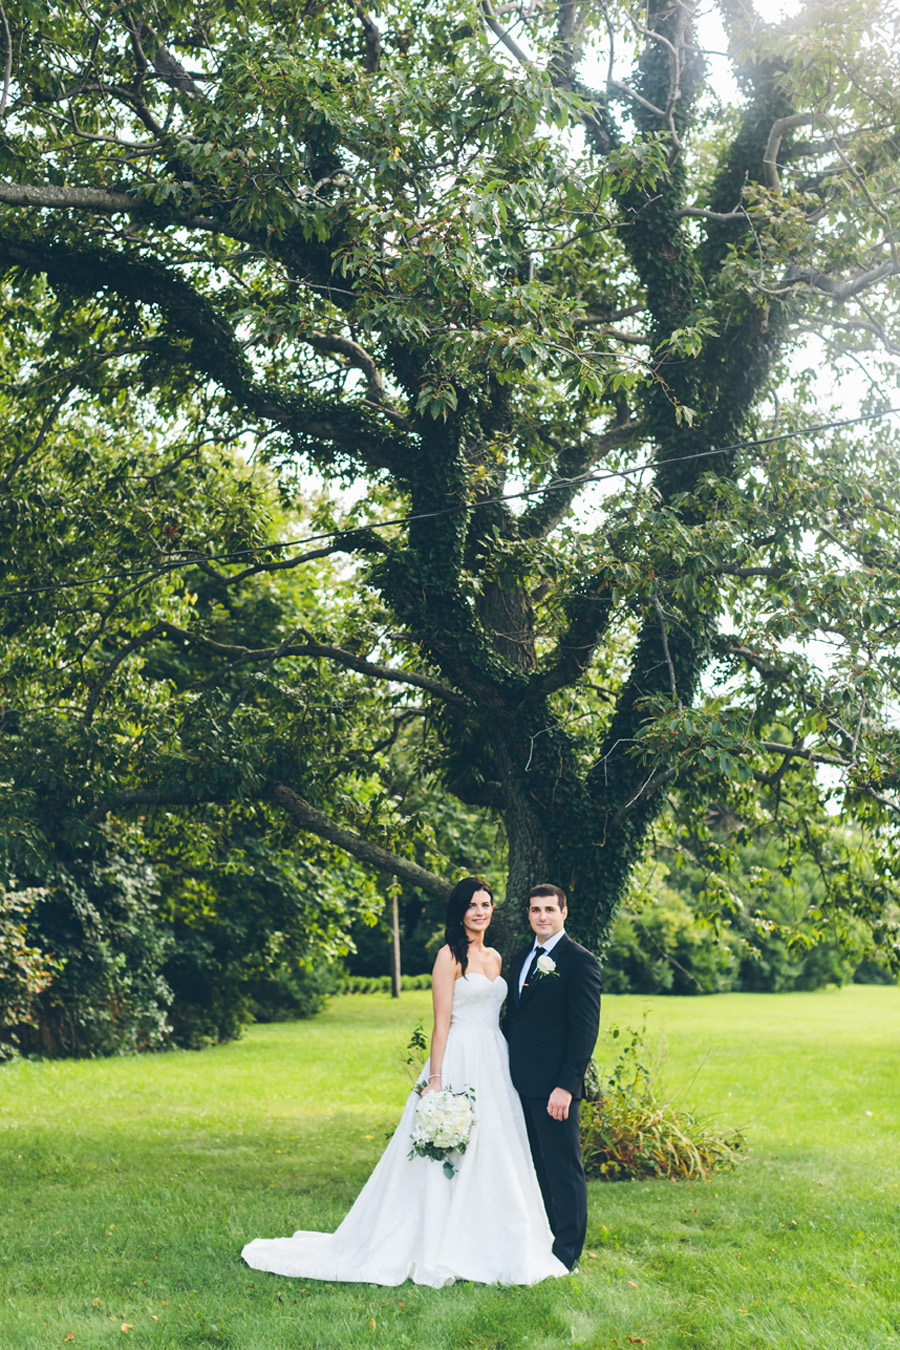 VICTORIA-BRIAN-NY-WEDDING-BRIDEGROOM-CYNTHIACHUNG-0171.jpg